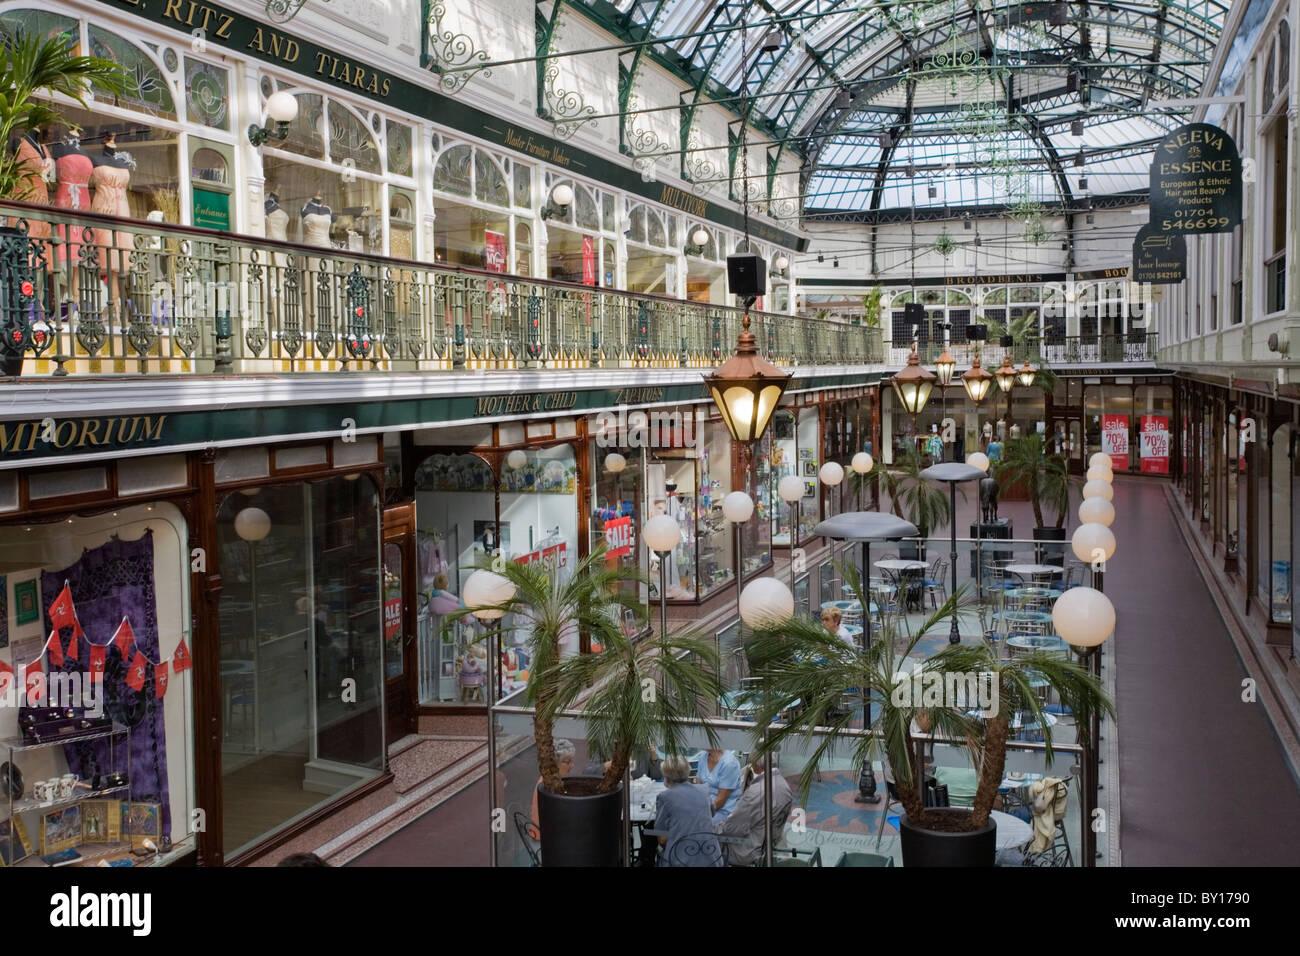 Wayfarers Arcade Lord Street Southport Merseyside